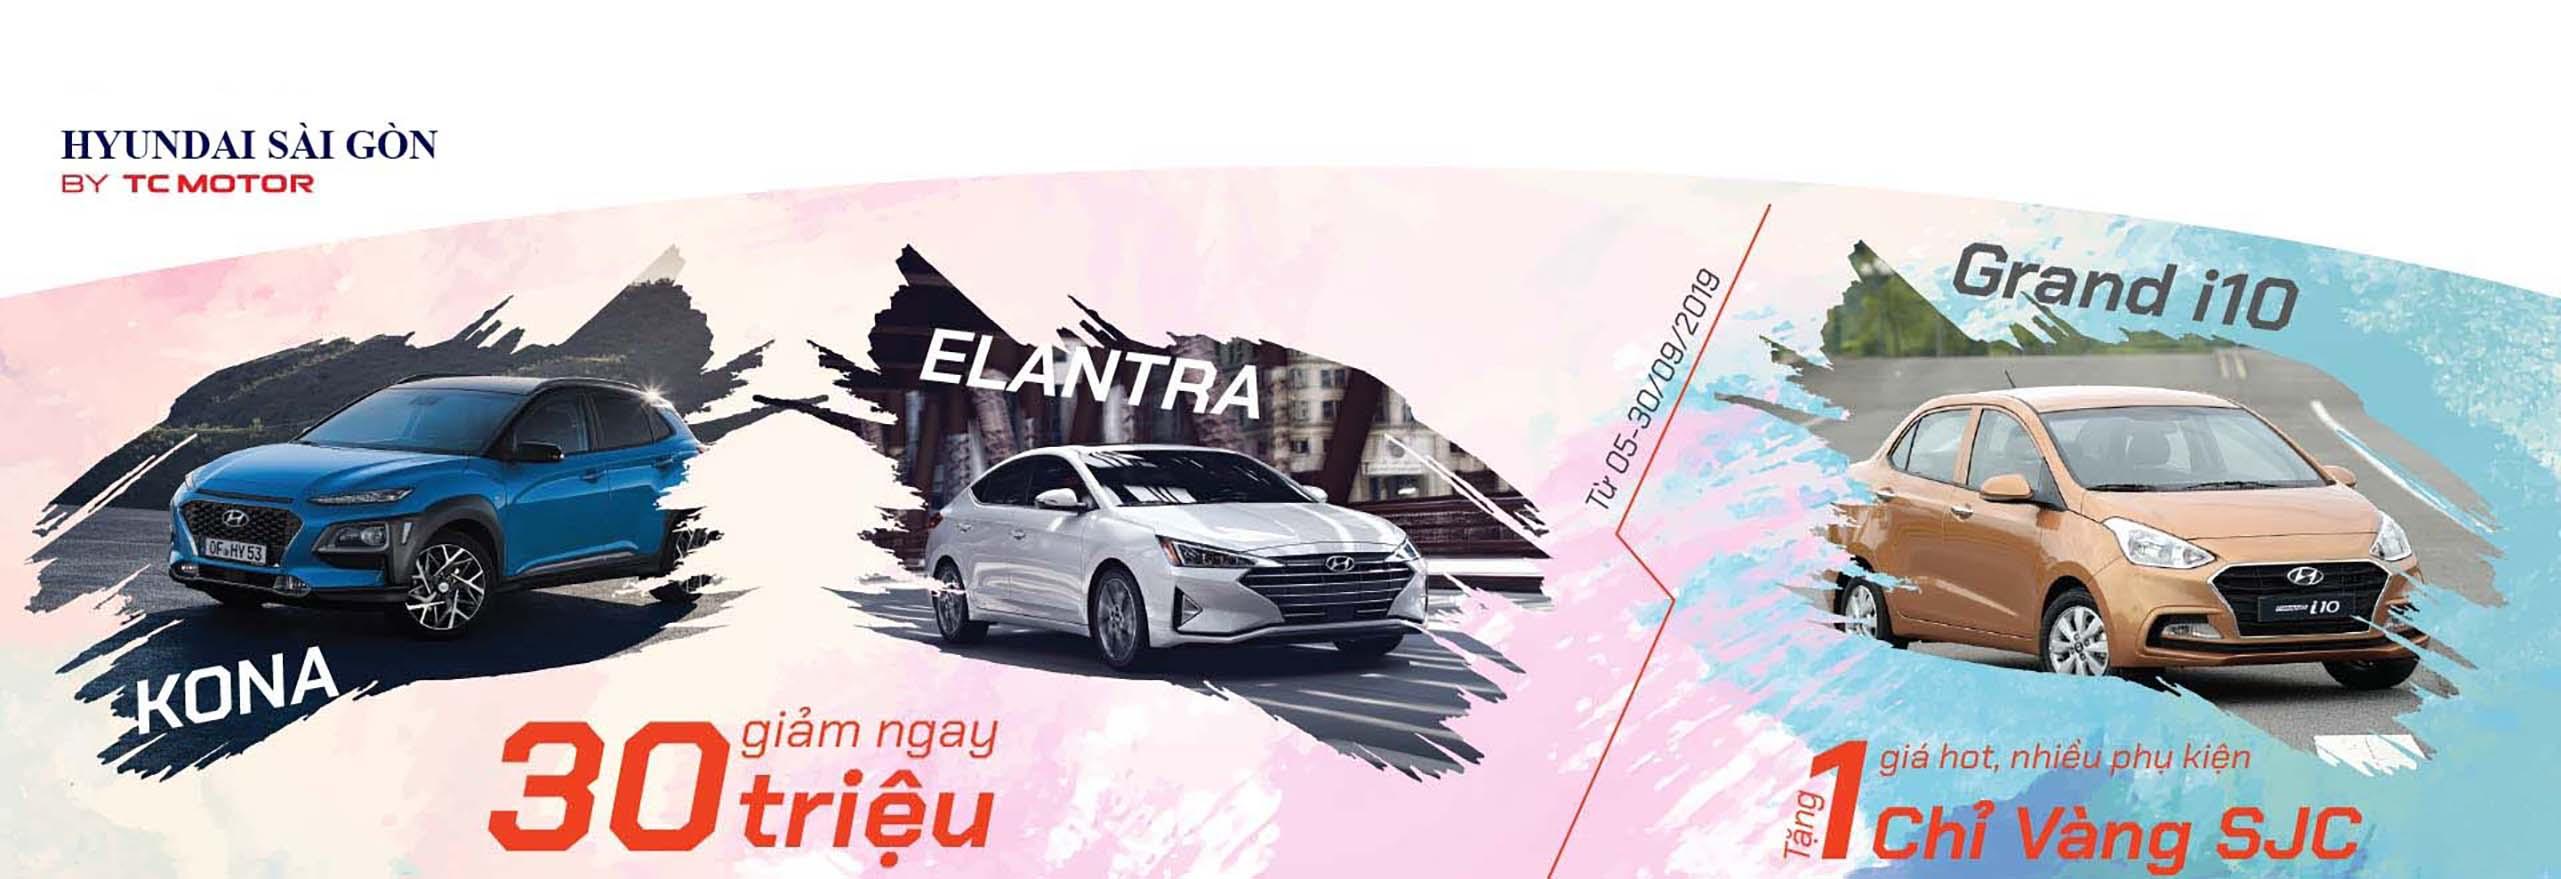 banner_thang9_hyundaisgvn